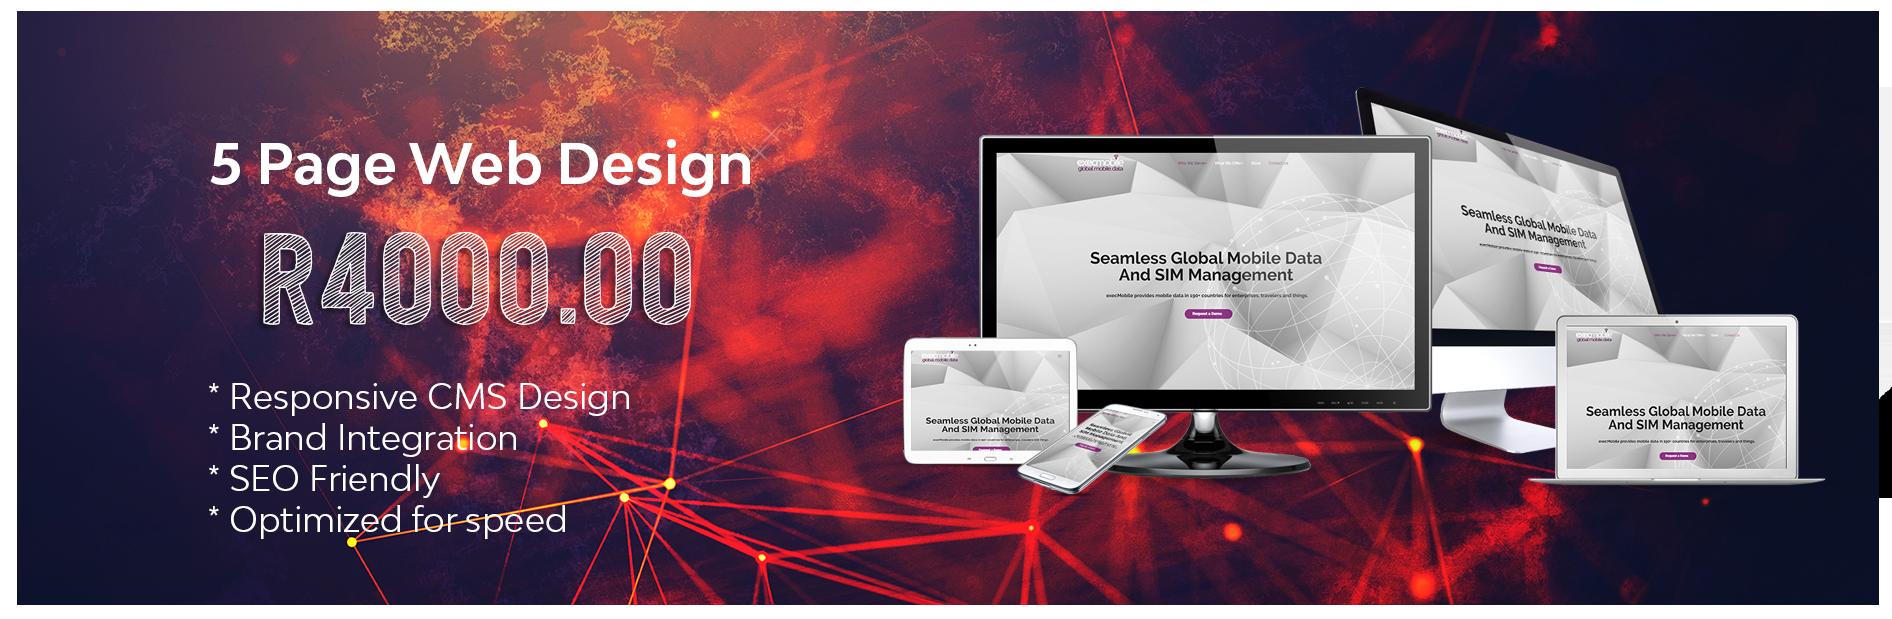 5 PAge Web Design